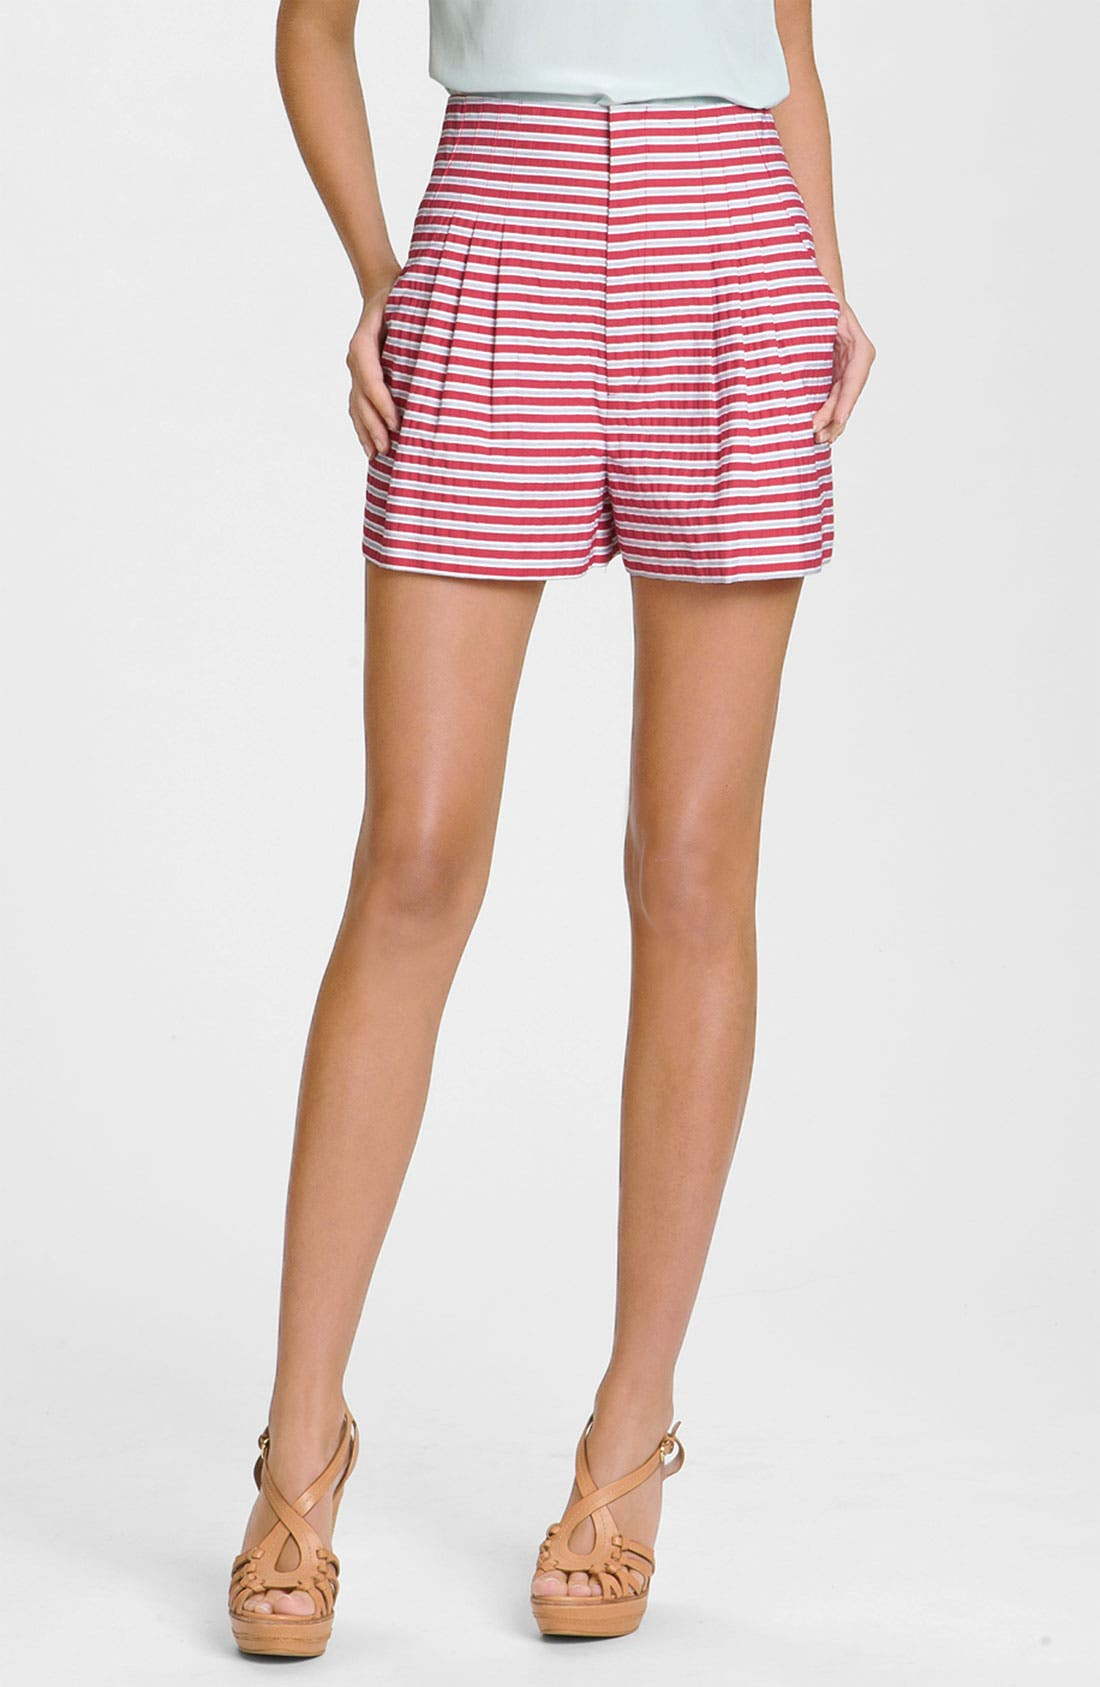 Main Image - Nanette Lepore 'Gold Rush' Striped Pleated Shorts